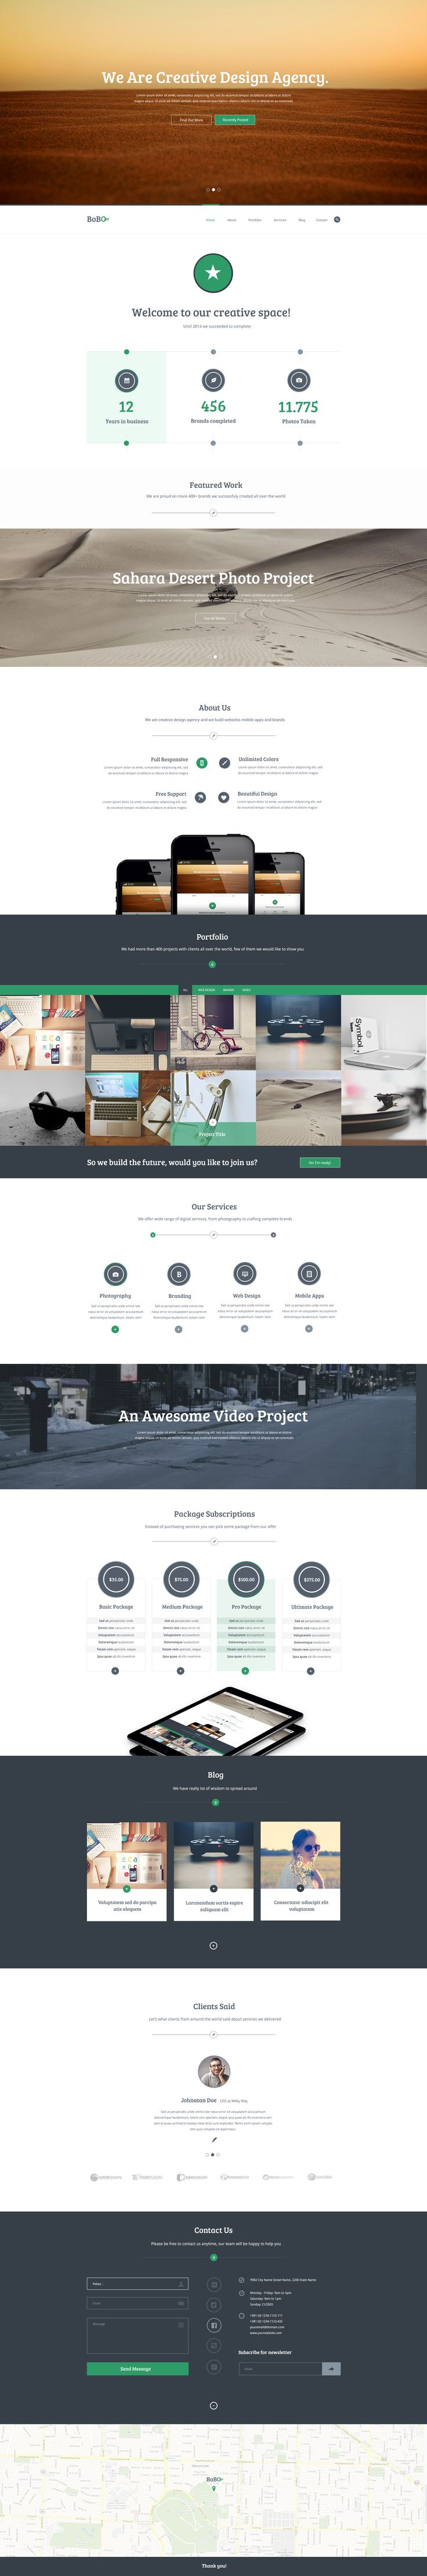 Bobo - One Page Creative Portfolio PSD Template